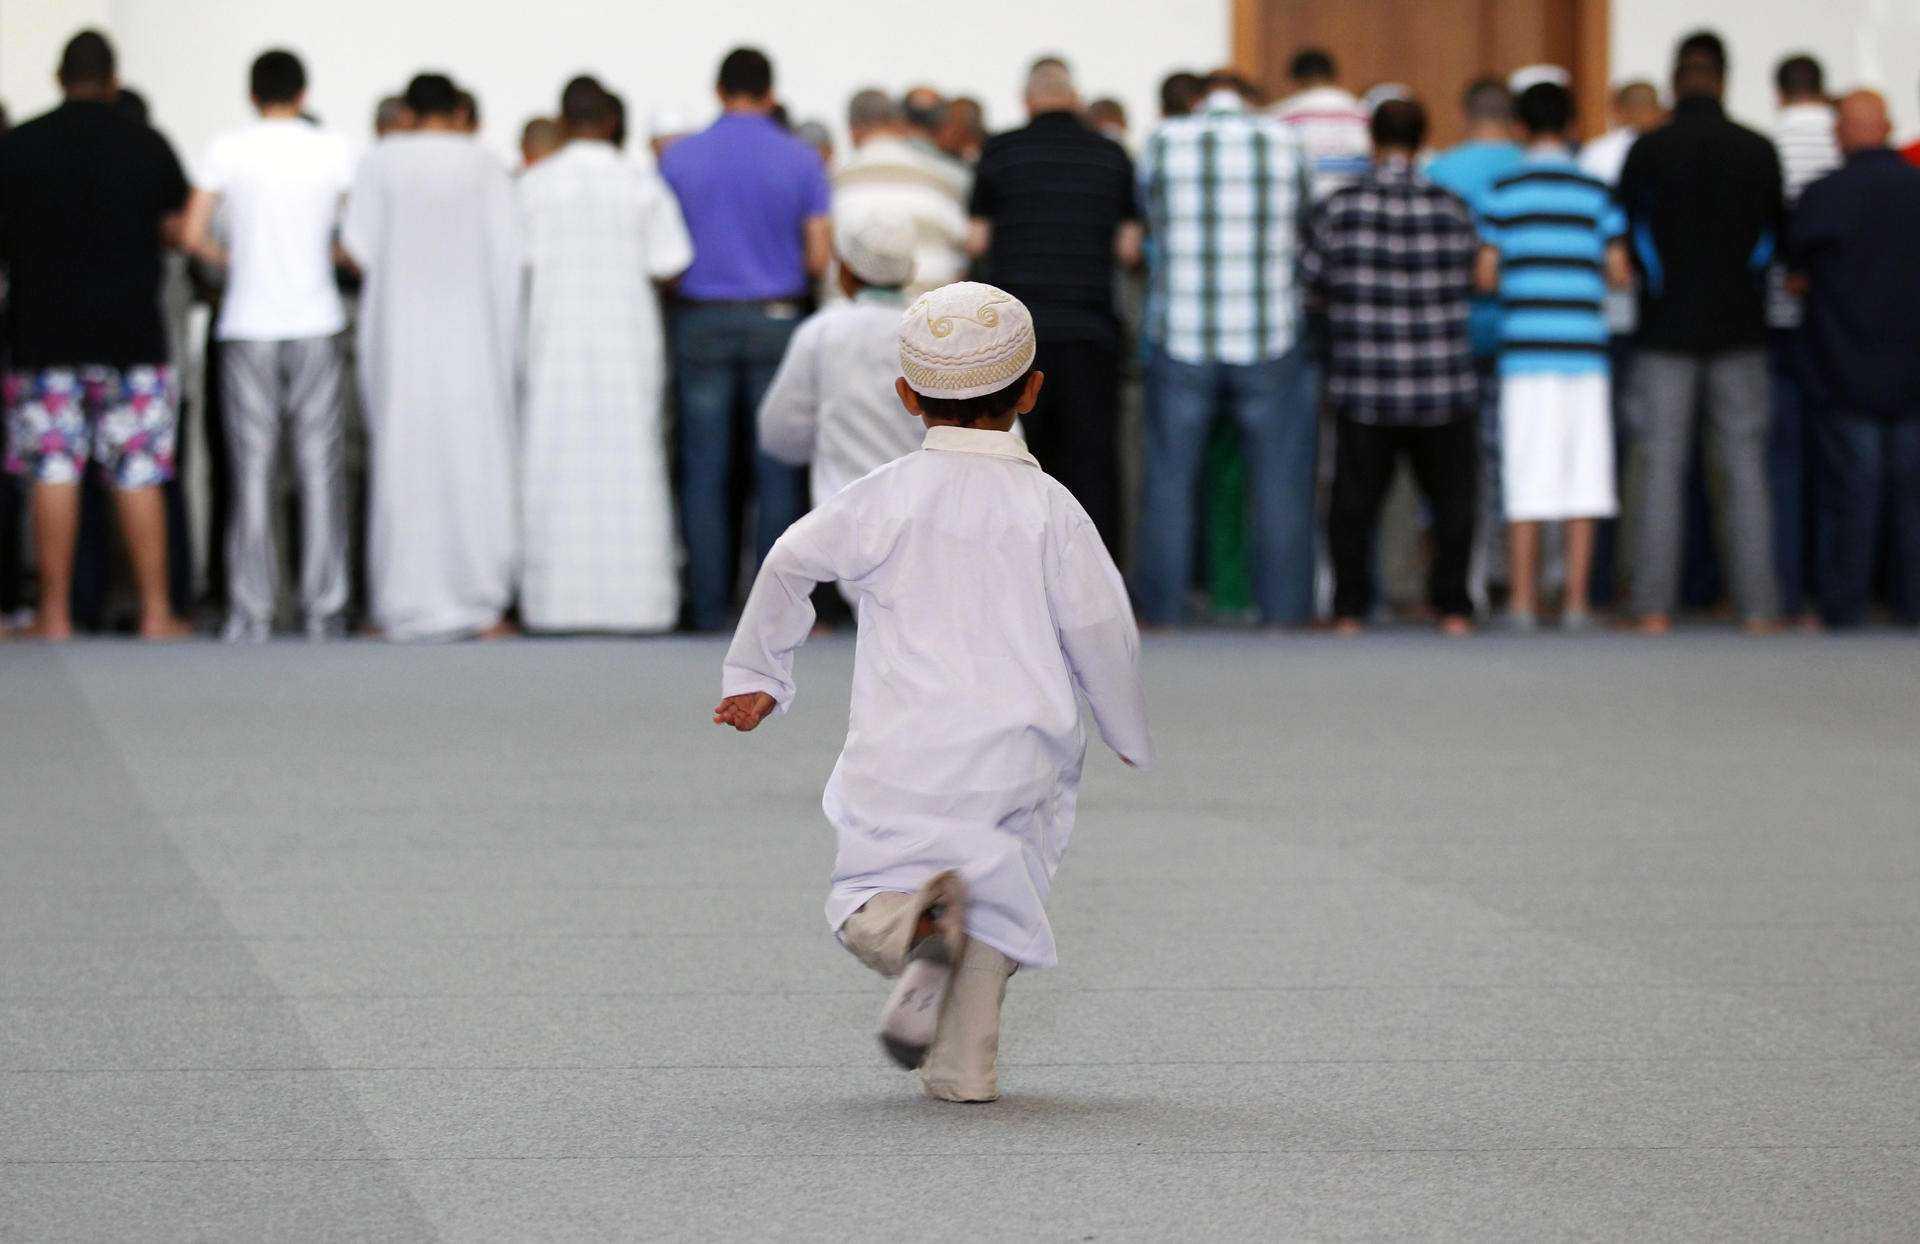 Anak-anak sholat di masjid